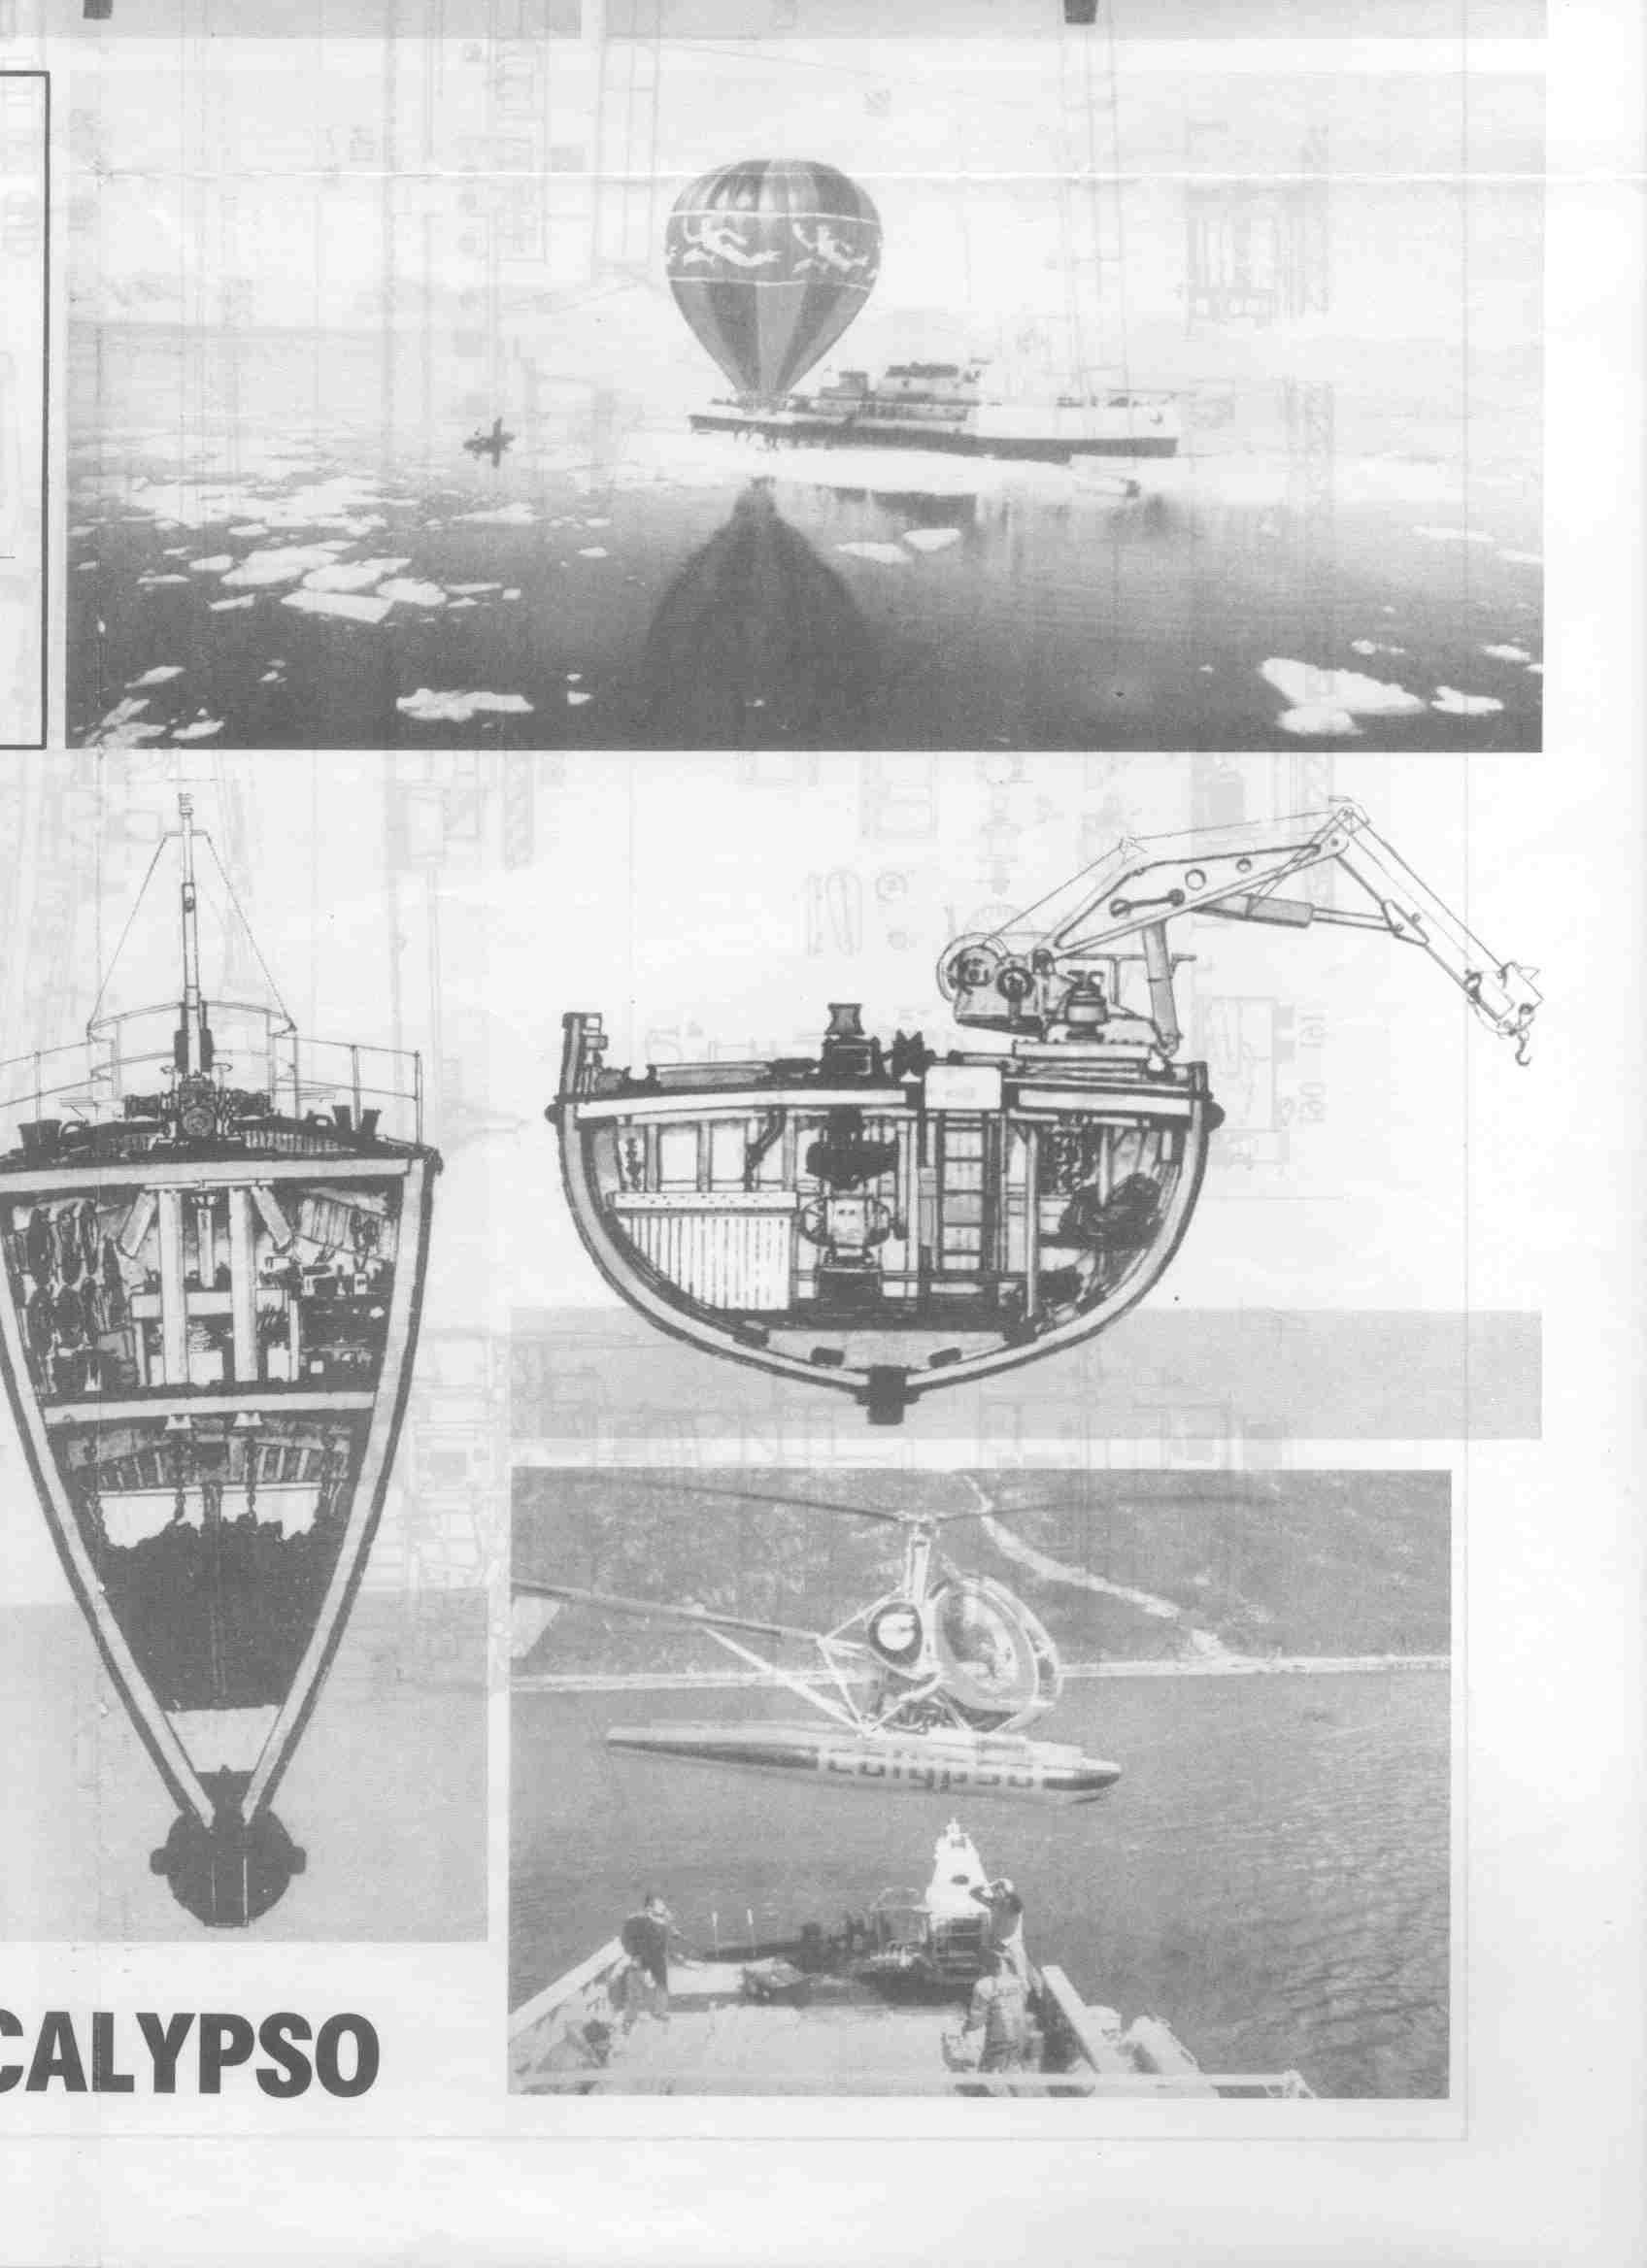 Calypso blueprint 7 cousteau pinterest calypso blueprint 7 malvernweather Gallery